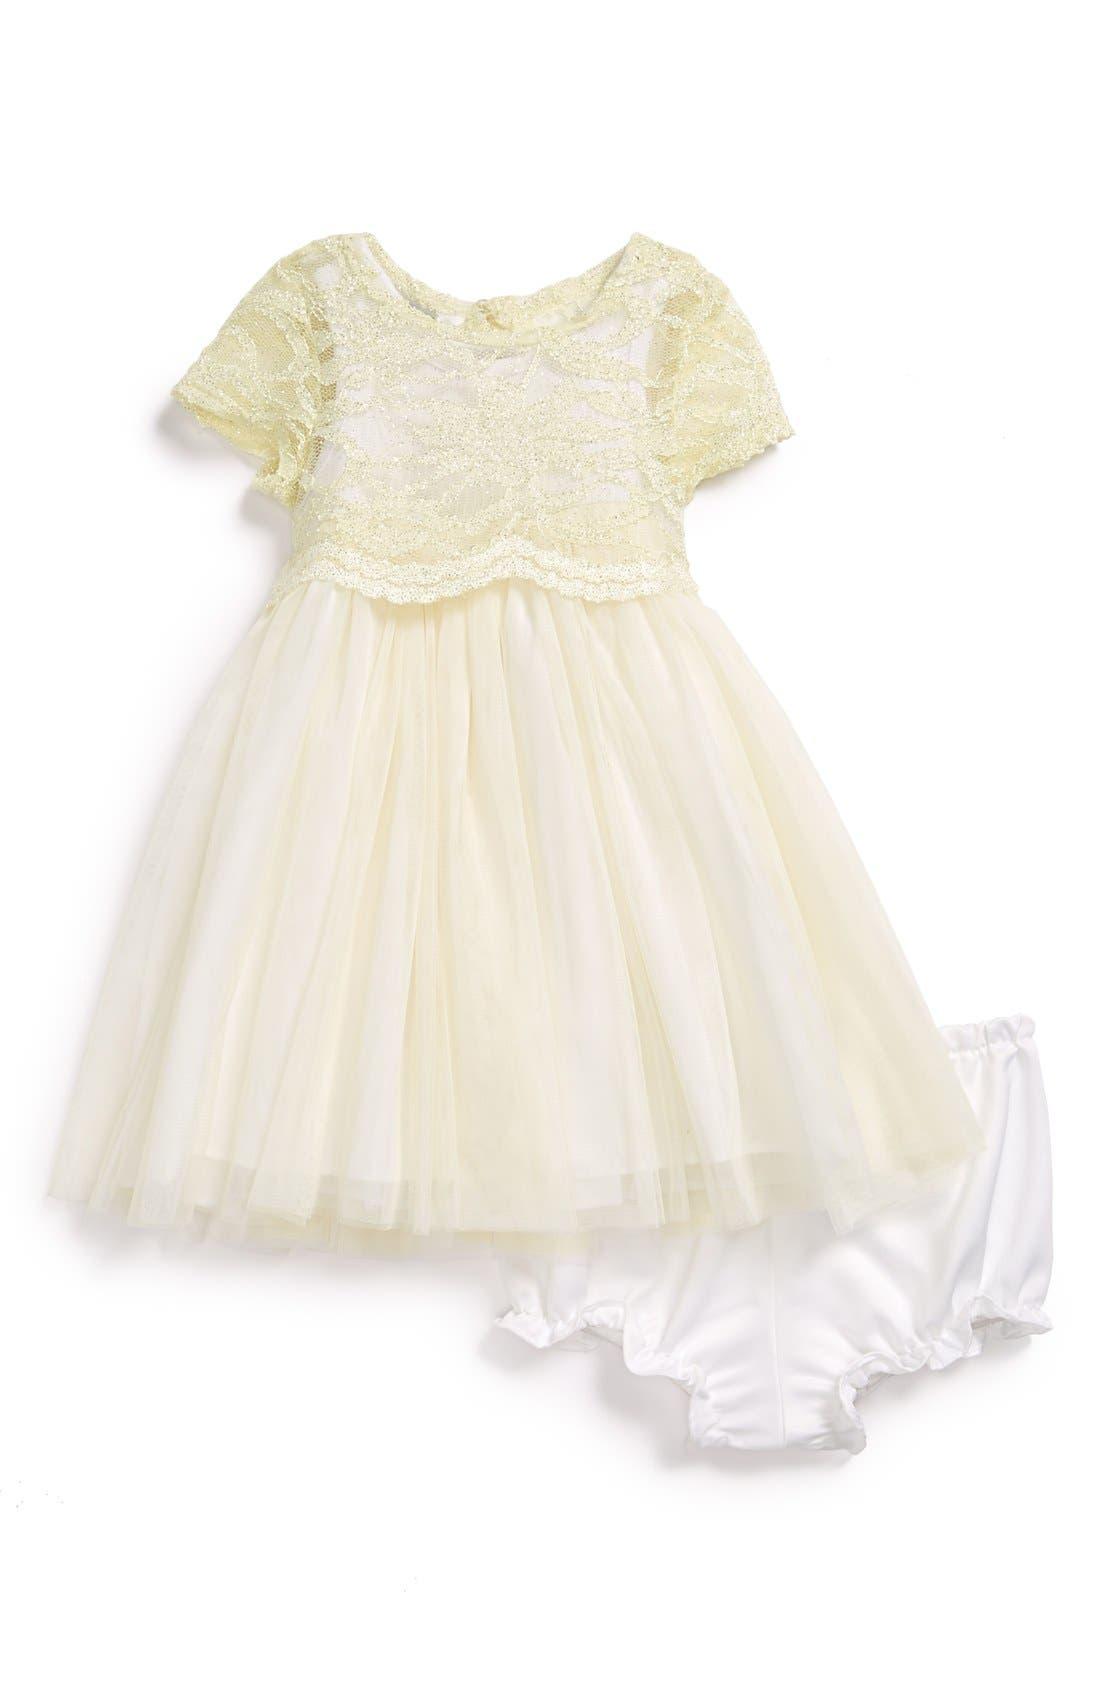 Main Image - Pippa & Julie 'Princess' Dress & Bloomers (Baby Girls)